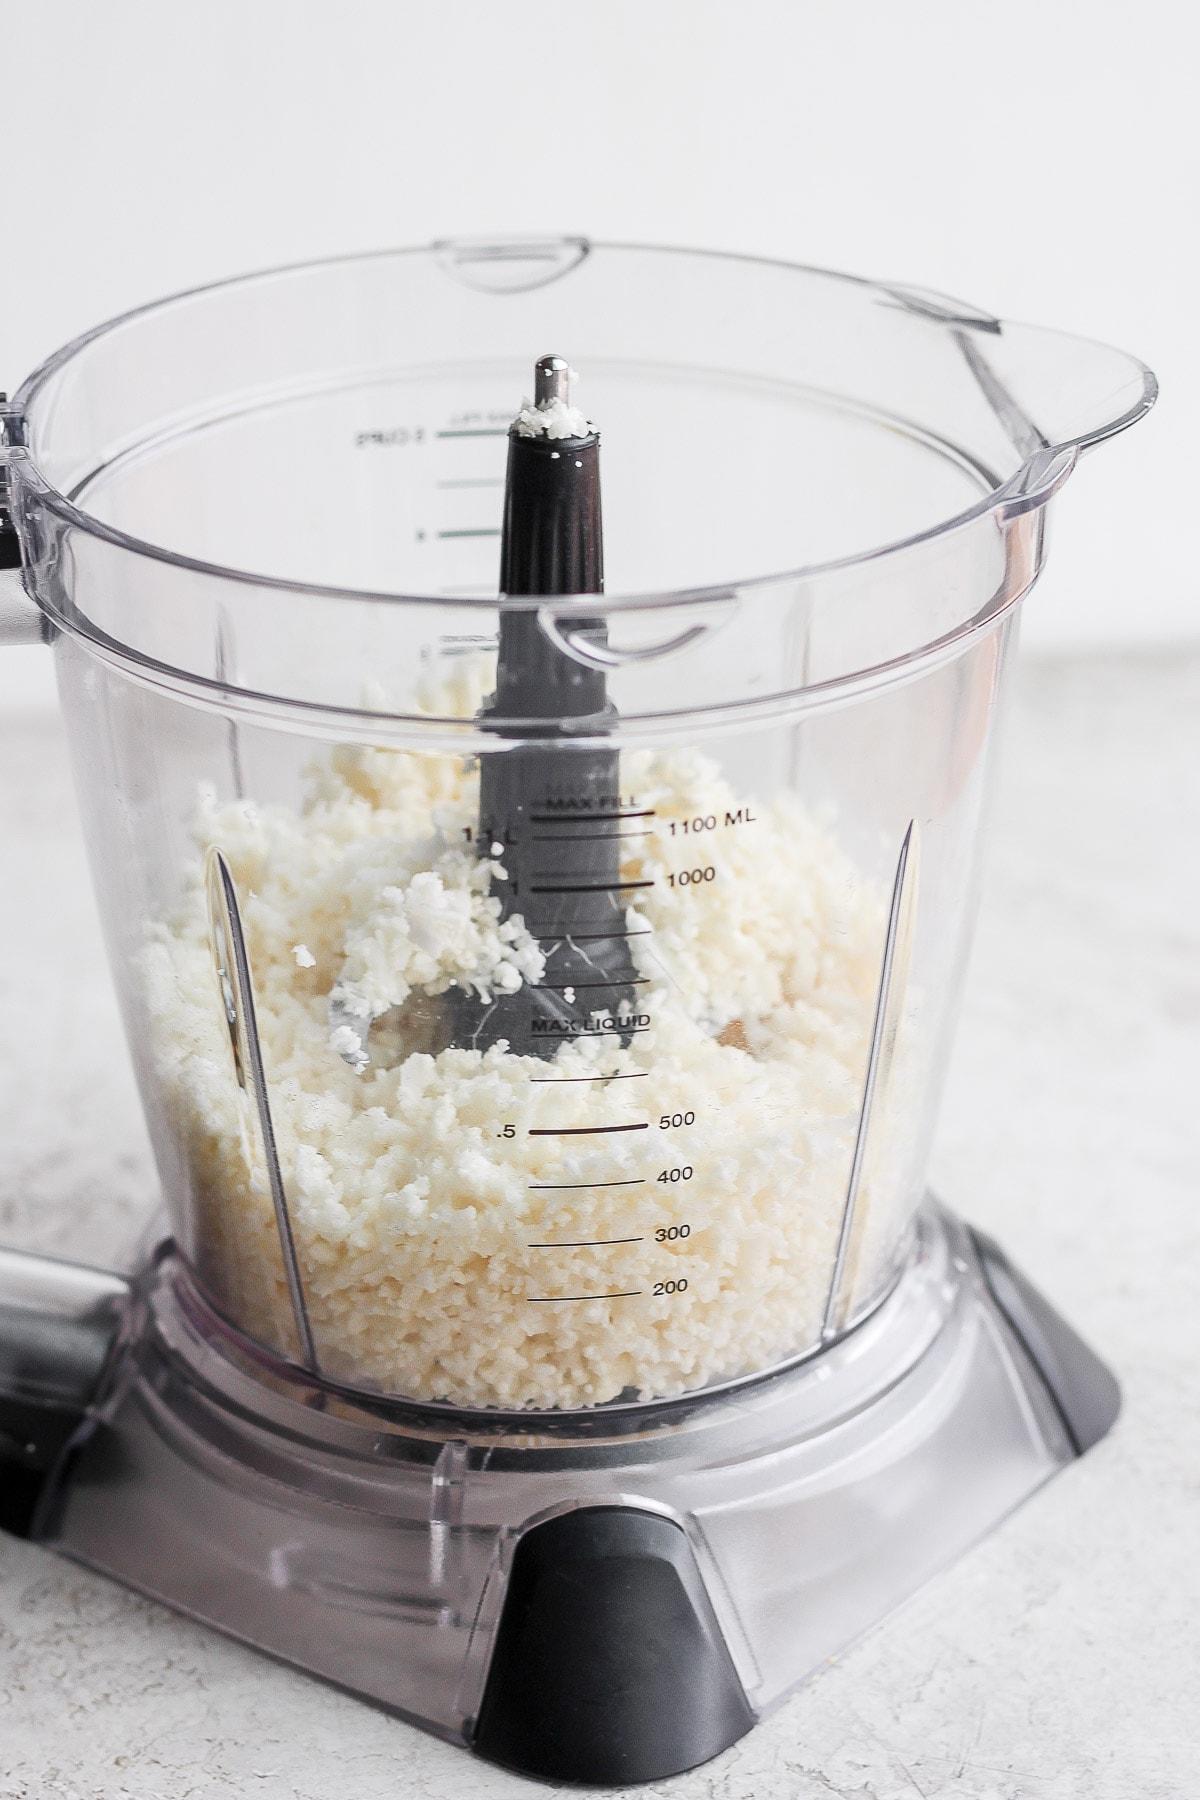 Cauliflower rice in a food processor.